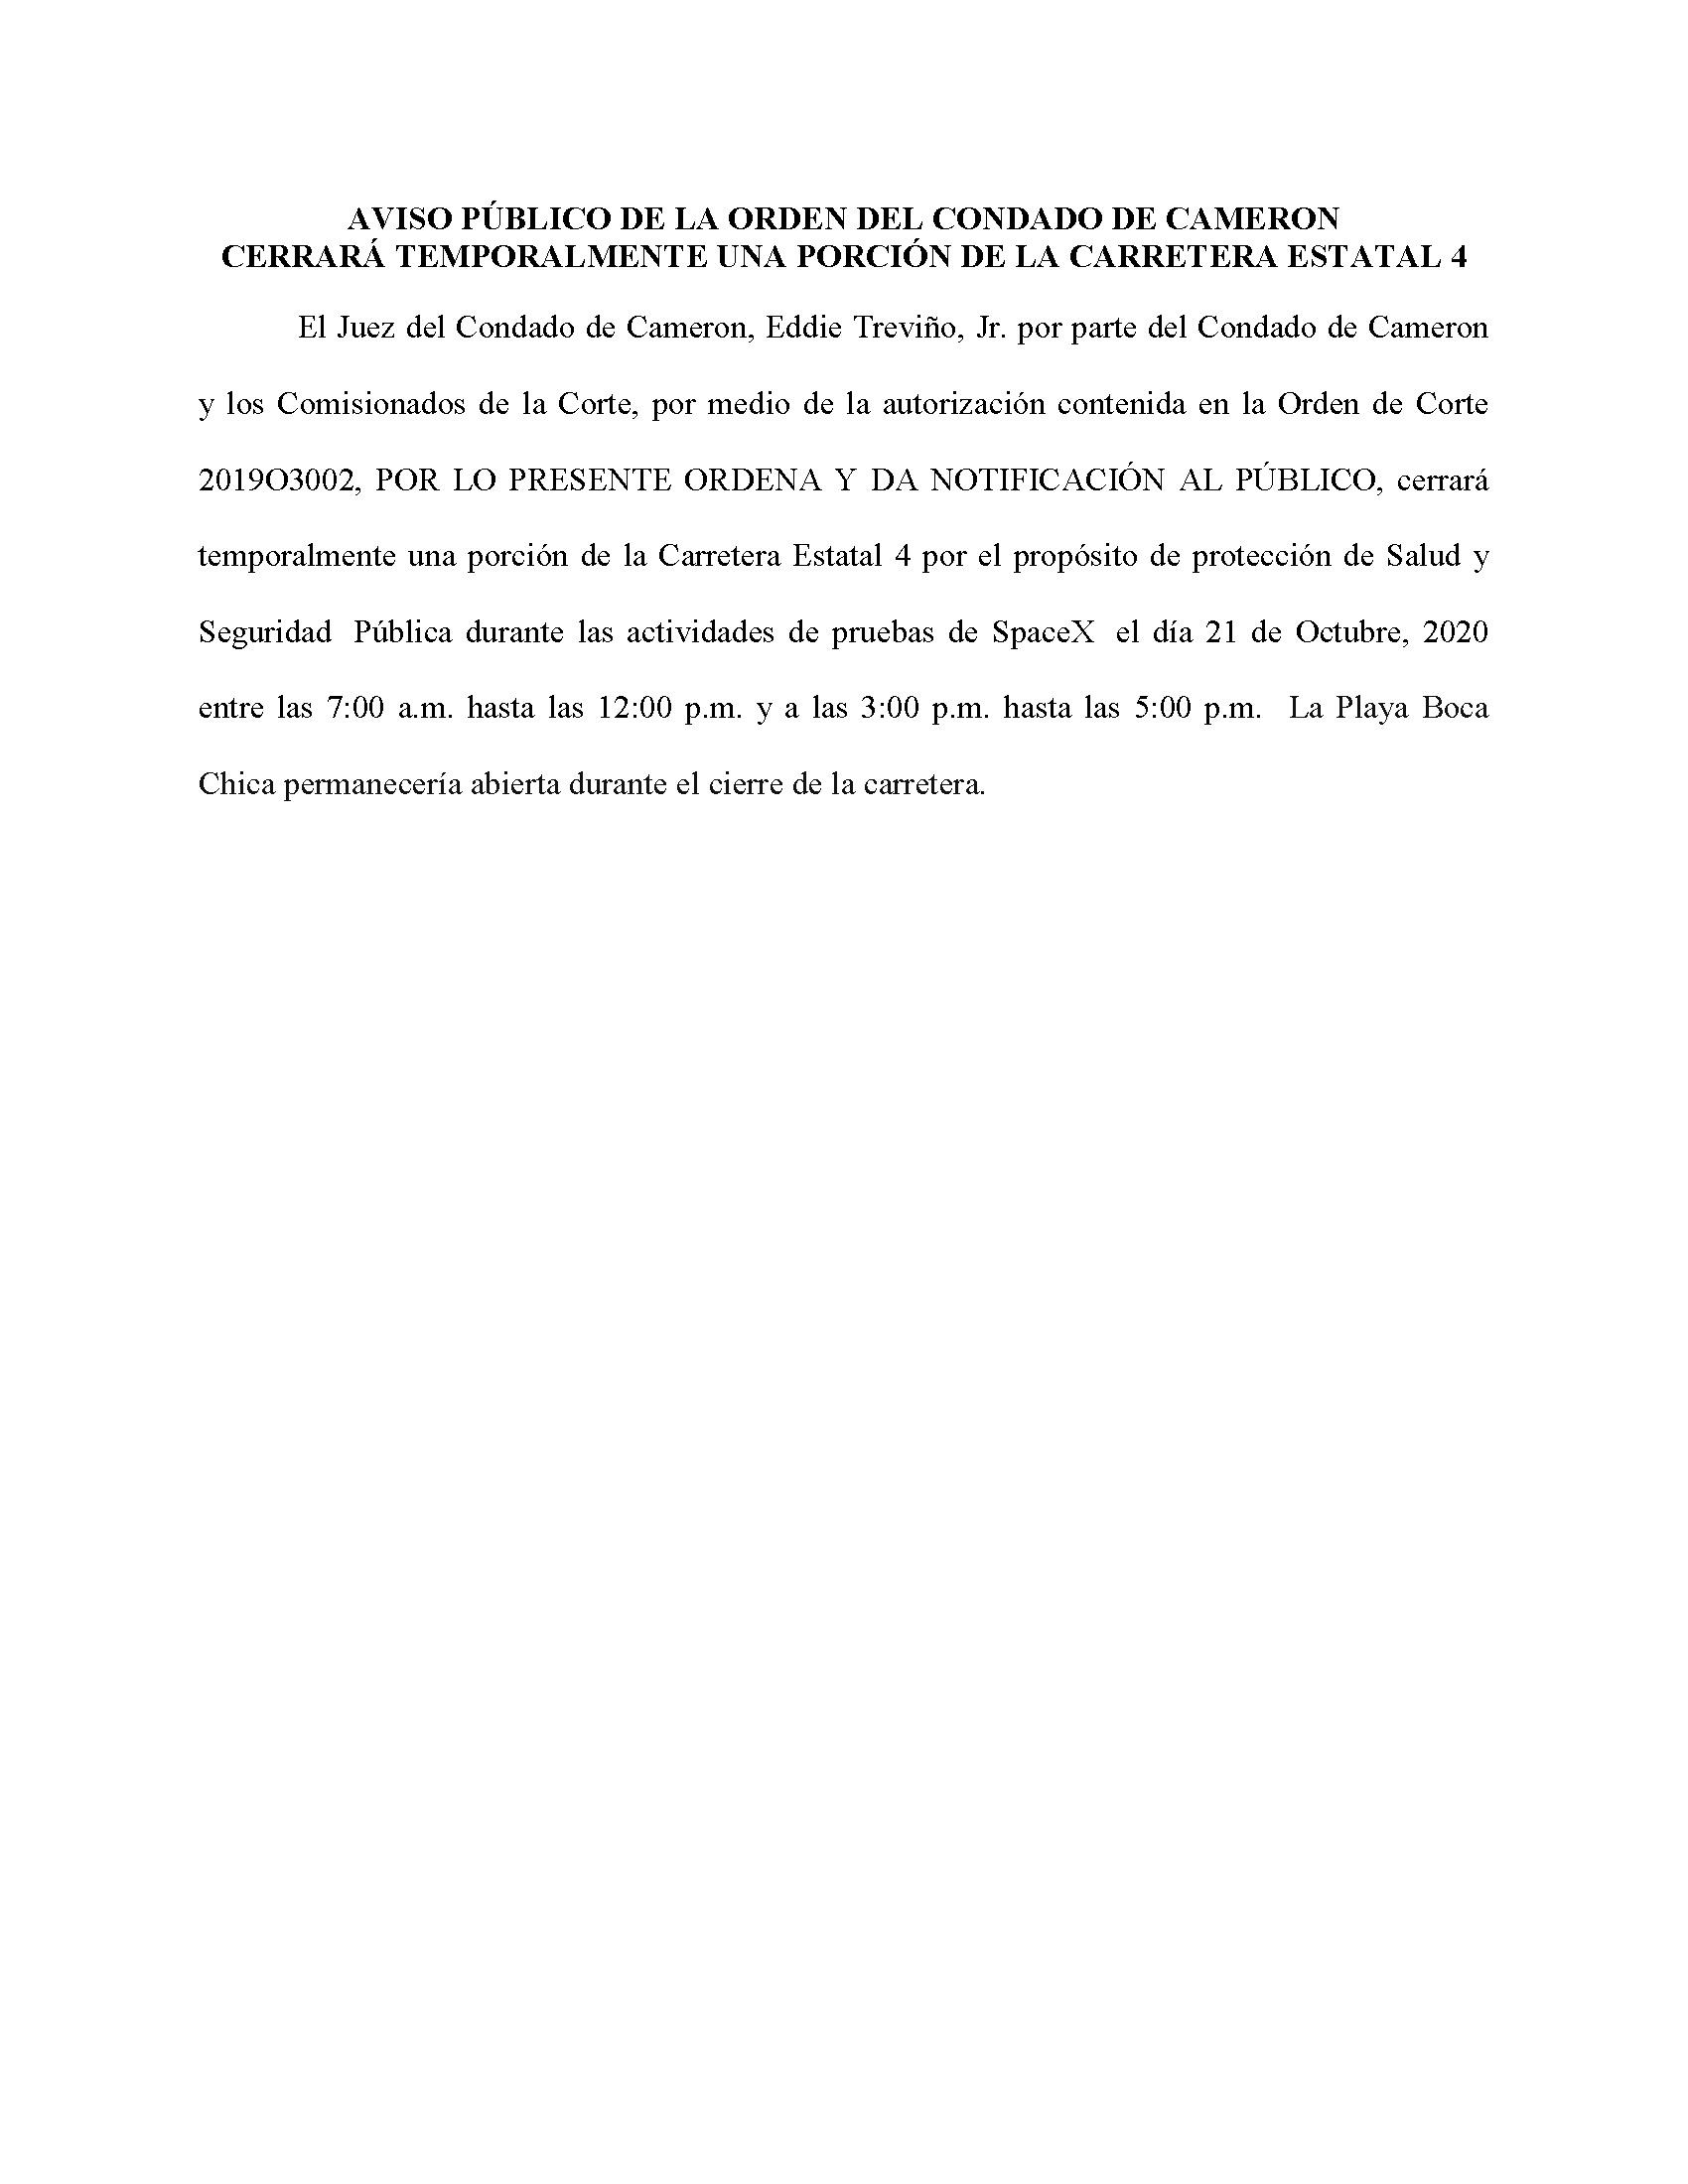 ORDER.CLOSURE OF HIGHWAY 4.SPANISH.10.21.20